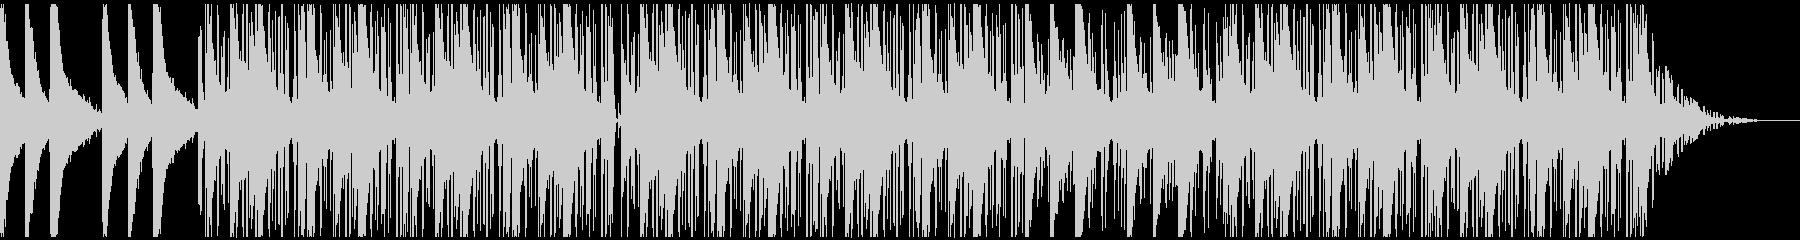 lofiヒップホップ:スクラッチFX無しの未再生の波形